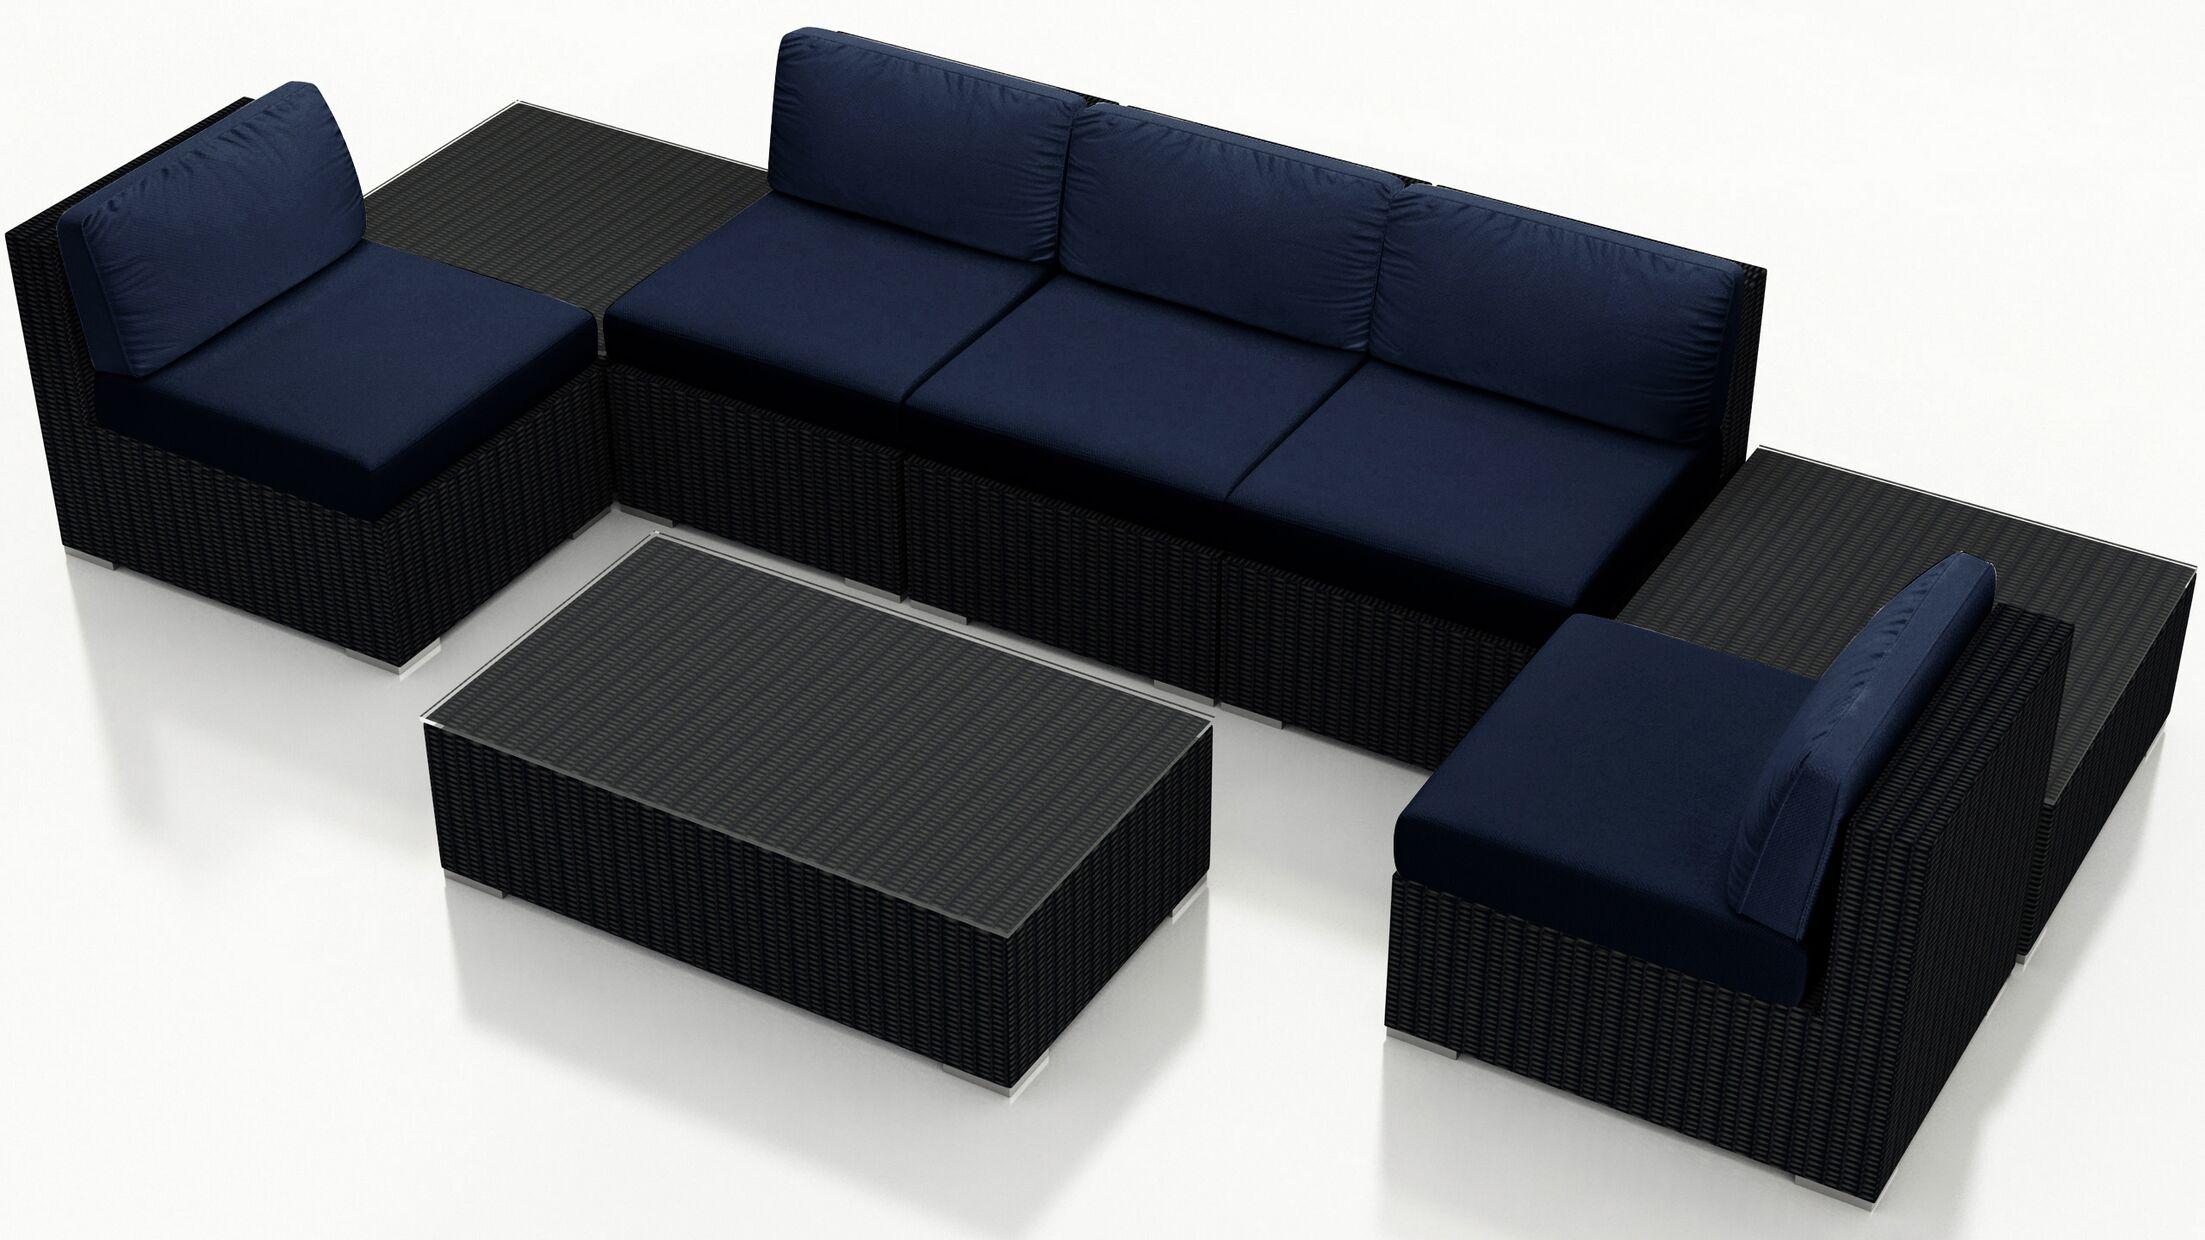 Urbana 8 Piece Sectional Set with Cushions Fabric: Indigo